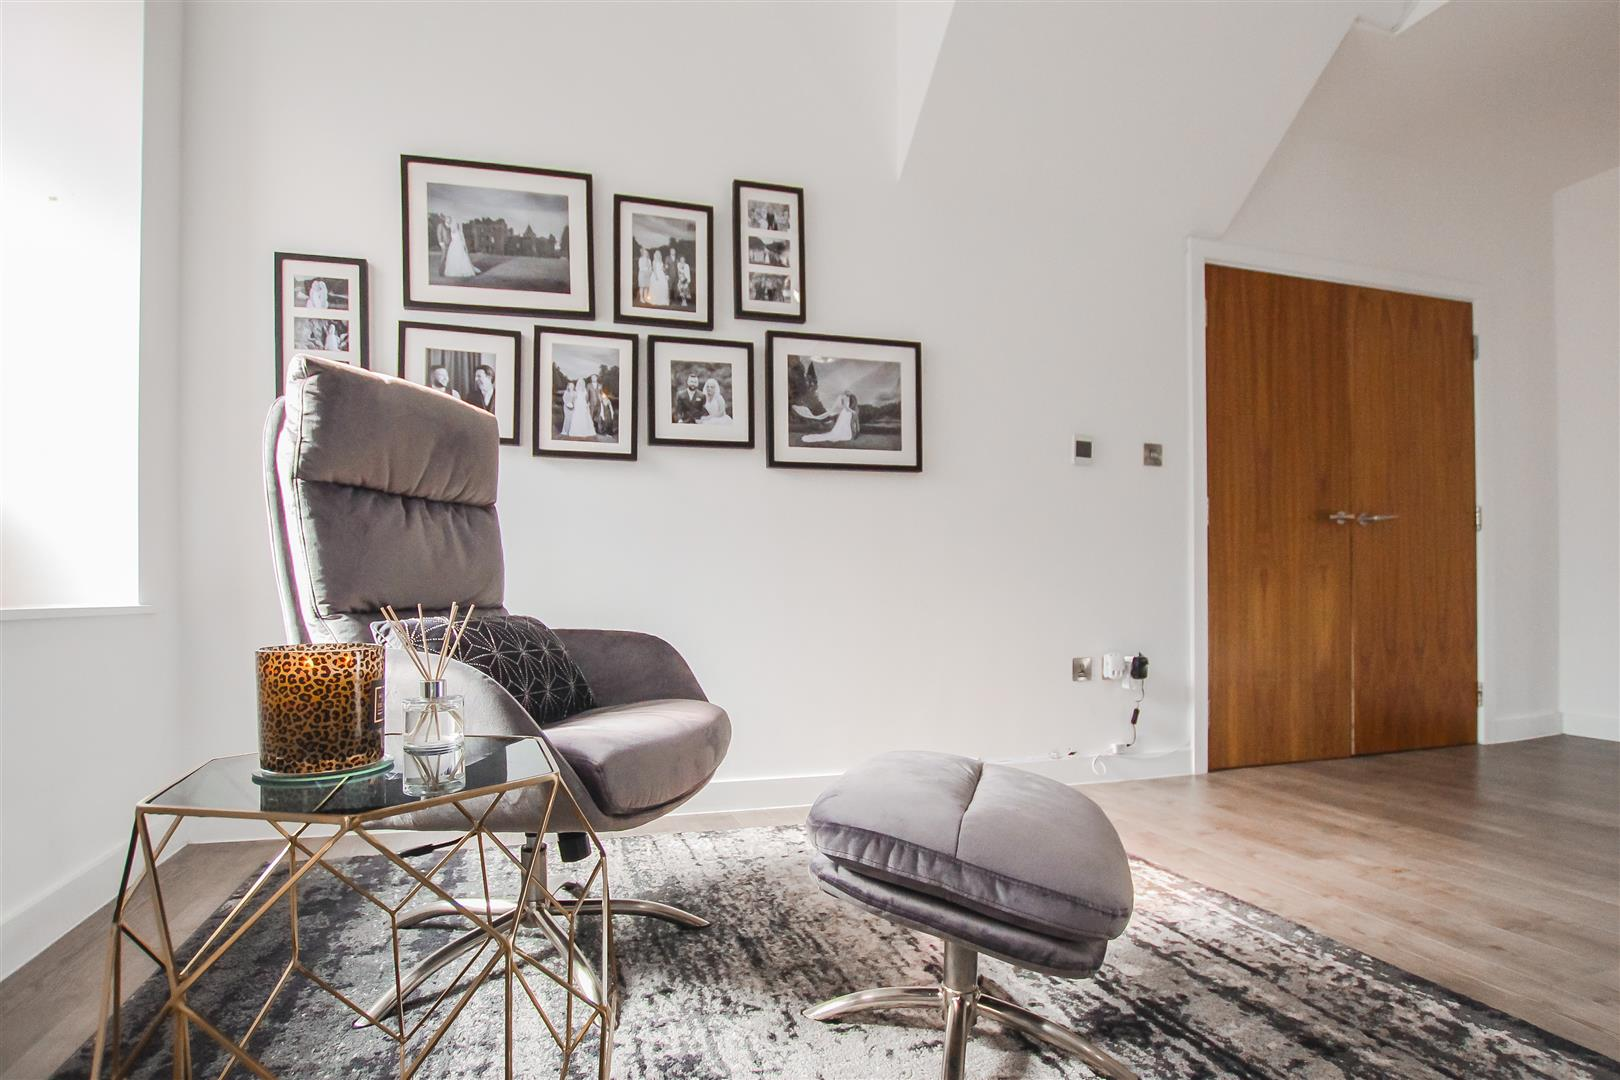 3 Bedroom Duplex Apartment For Sale - Image 13